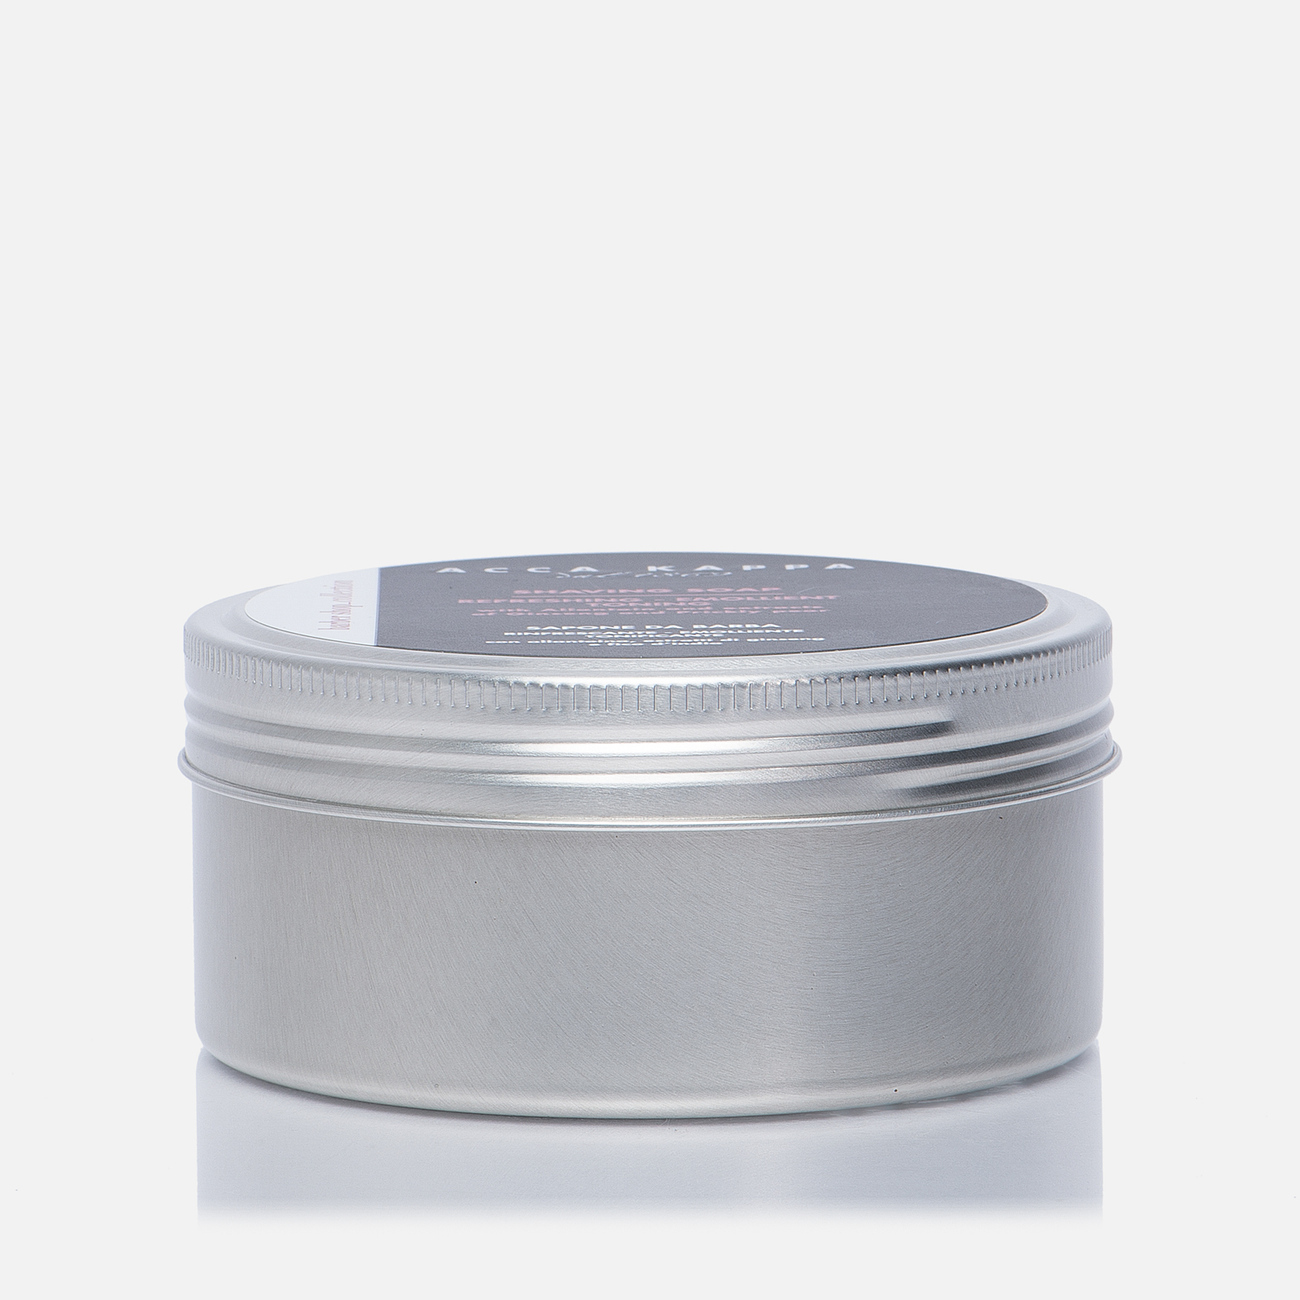 Мыло для бритья Acca Kappa Shaving 250ml